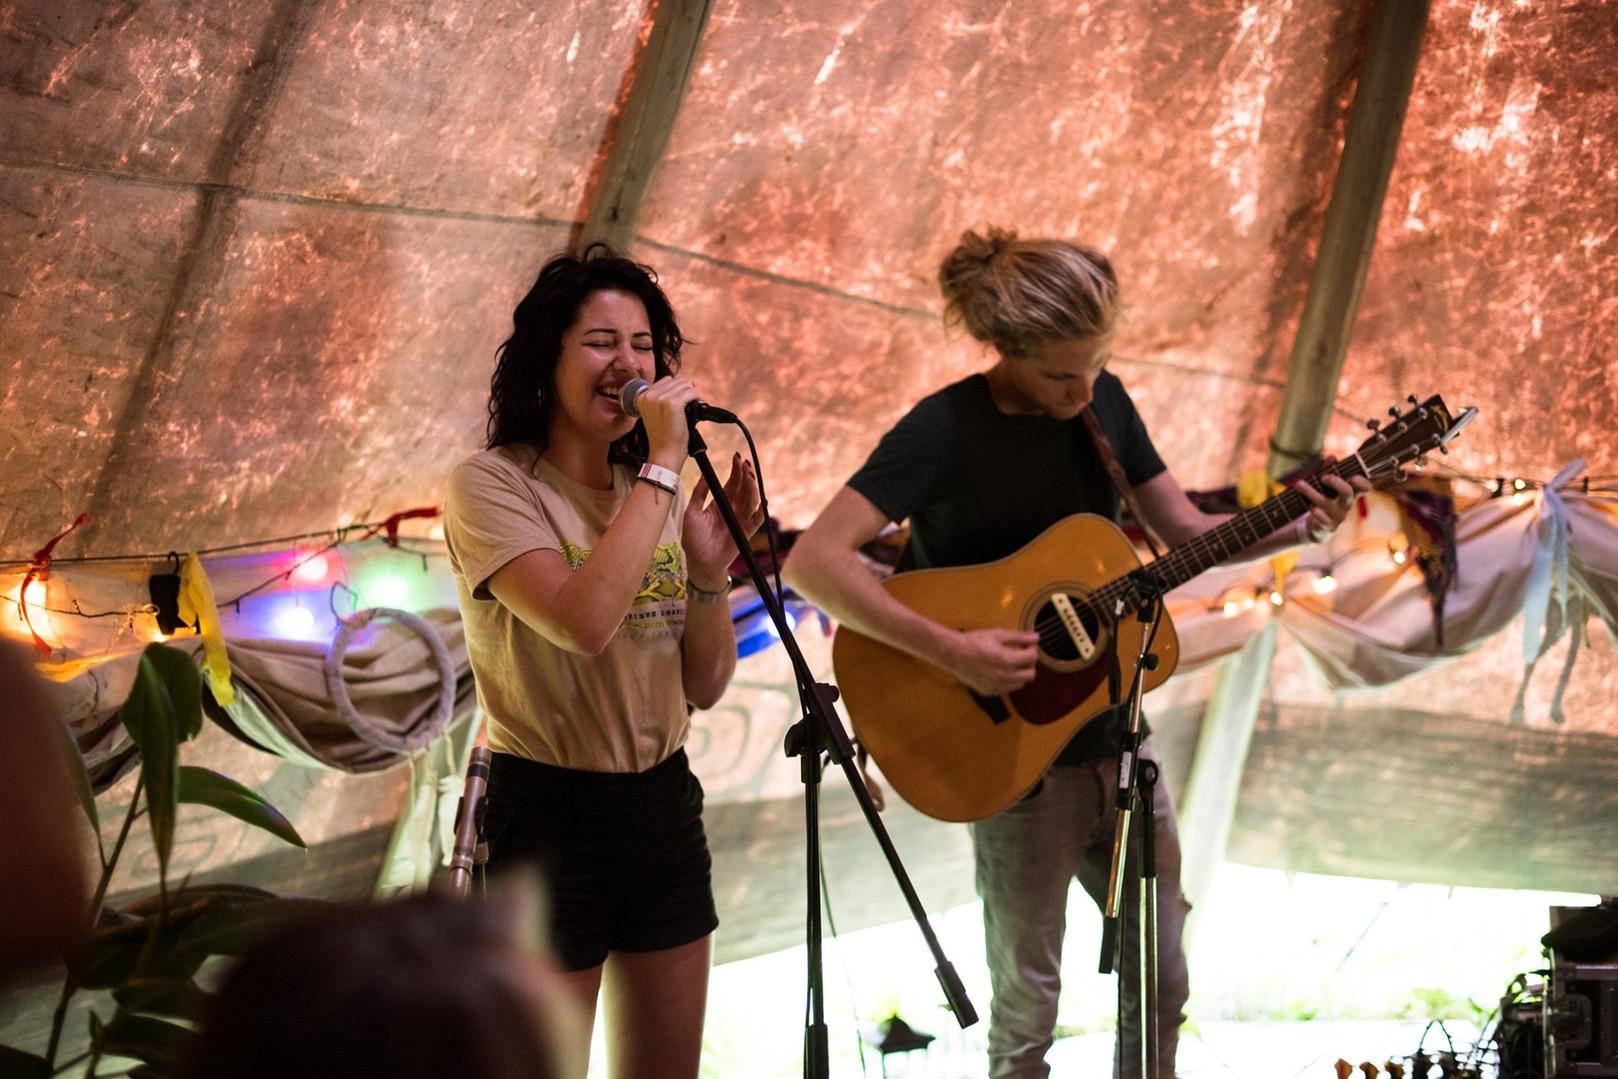 Mariëlle_Flens_performing_in_the_Tipi.j